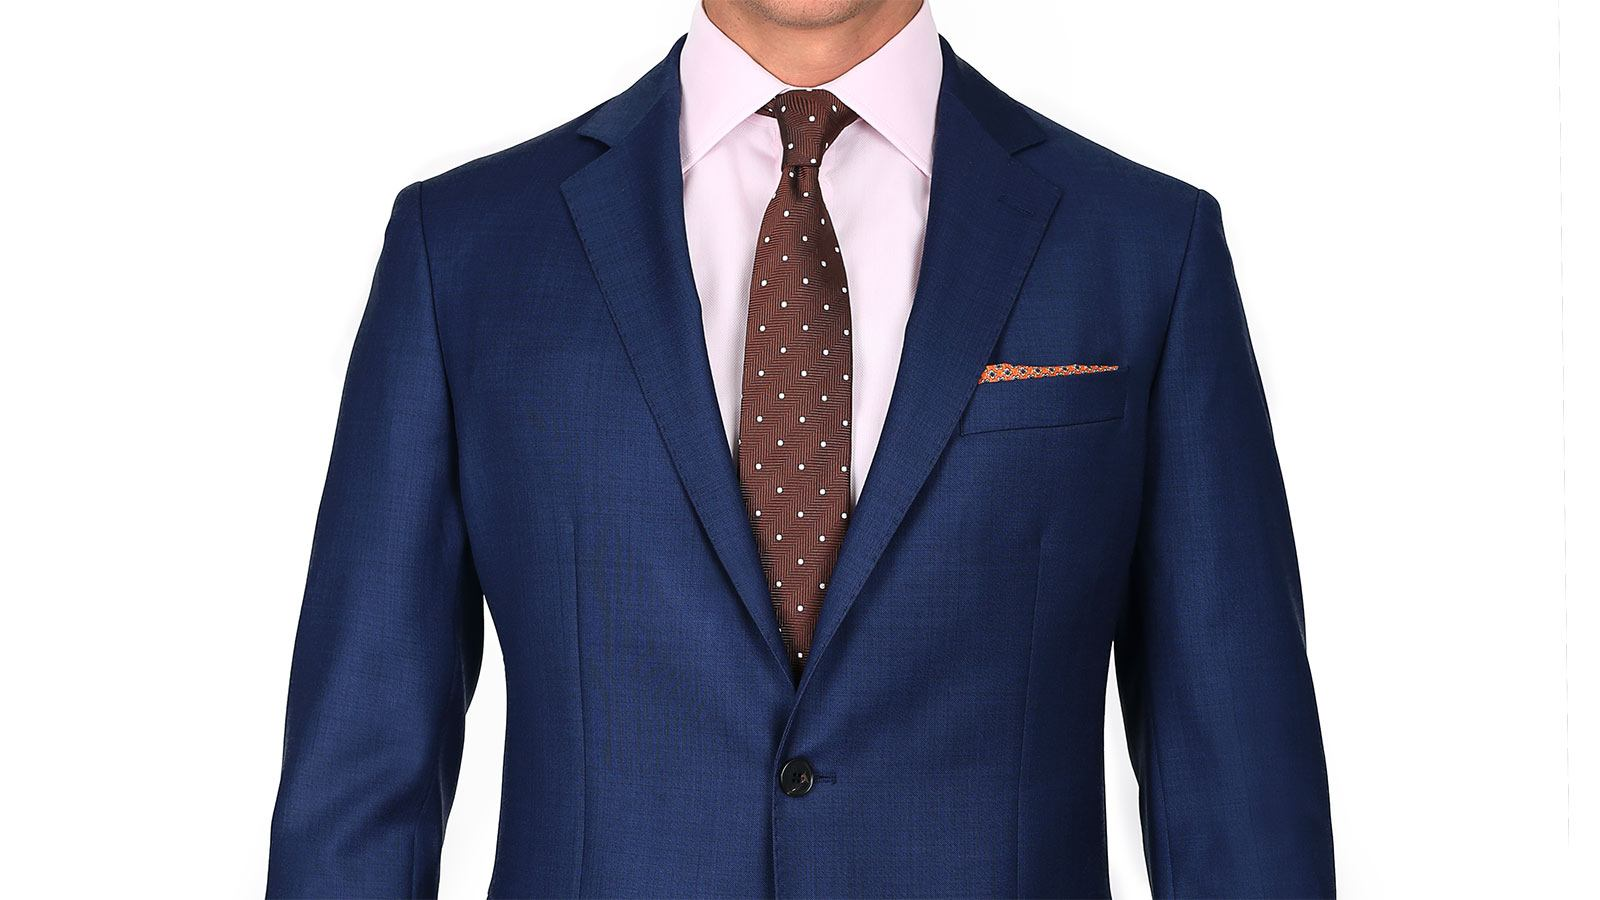 Suit in Intense Blue Pick & Pick Wool - slider image 1